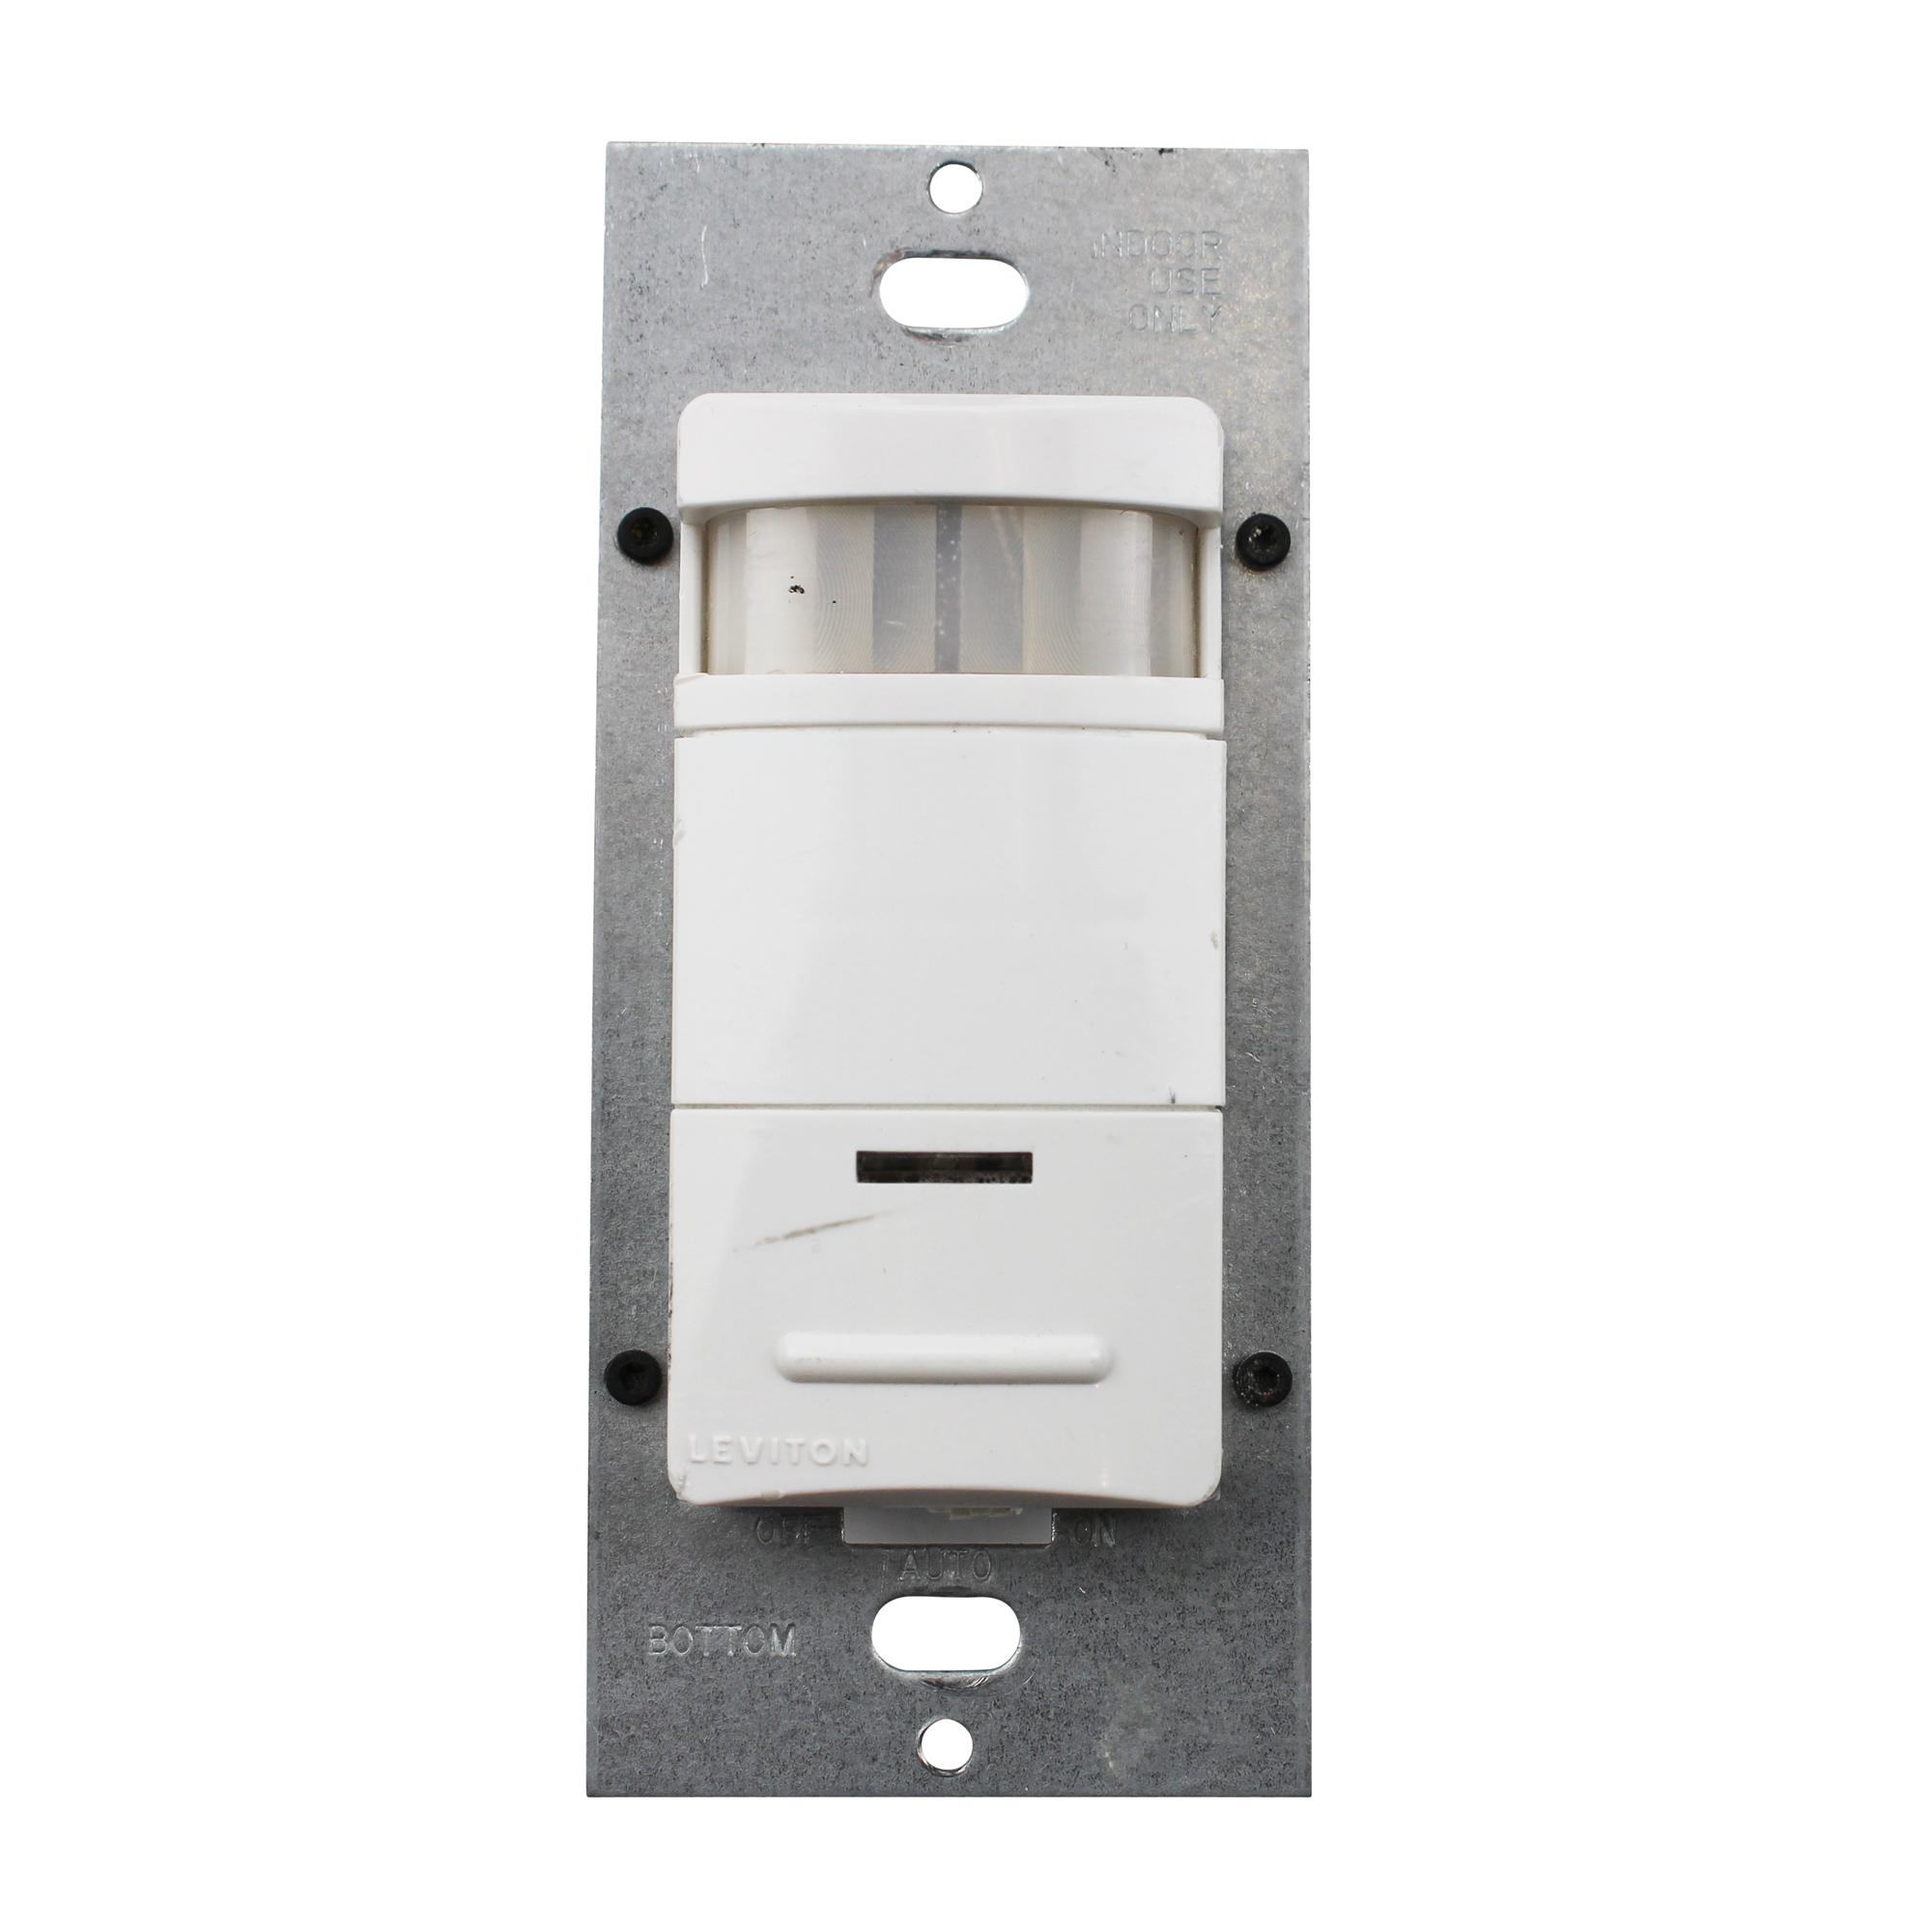 hight resolution of hpm motion sensor manual wordpress com